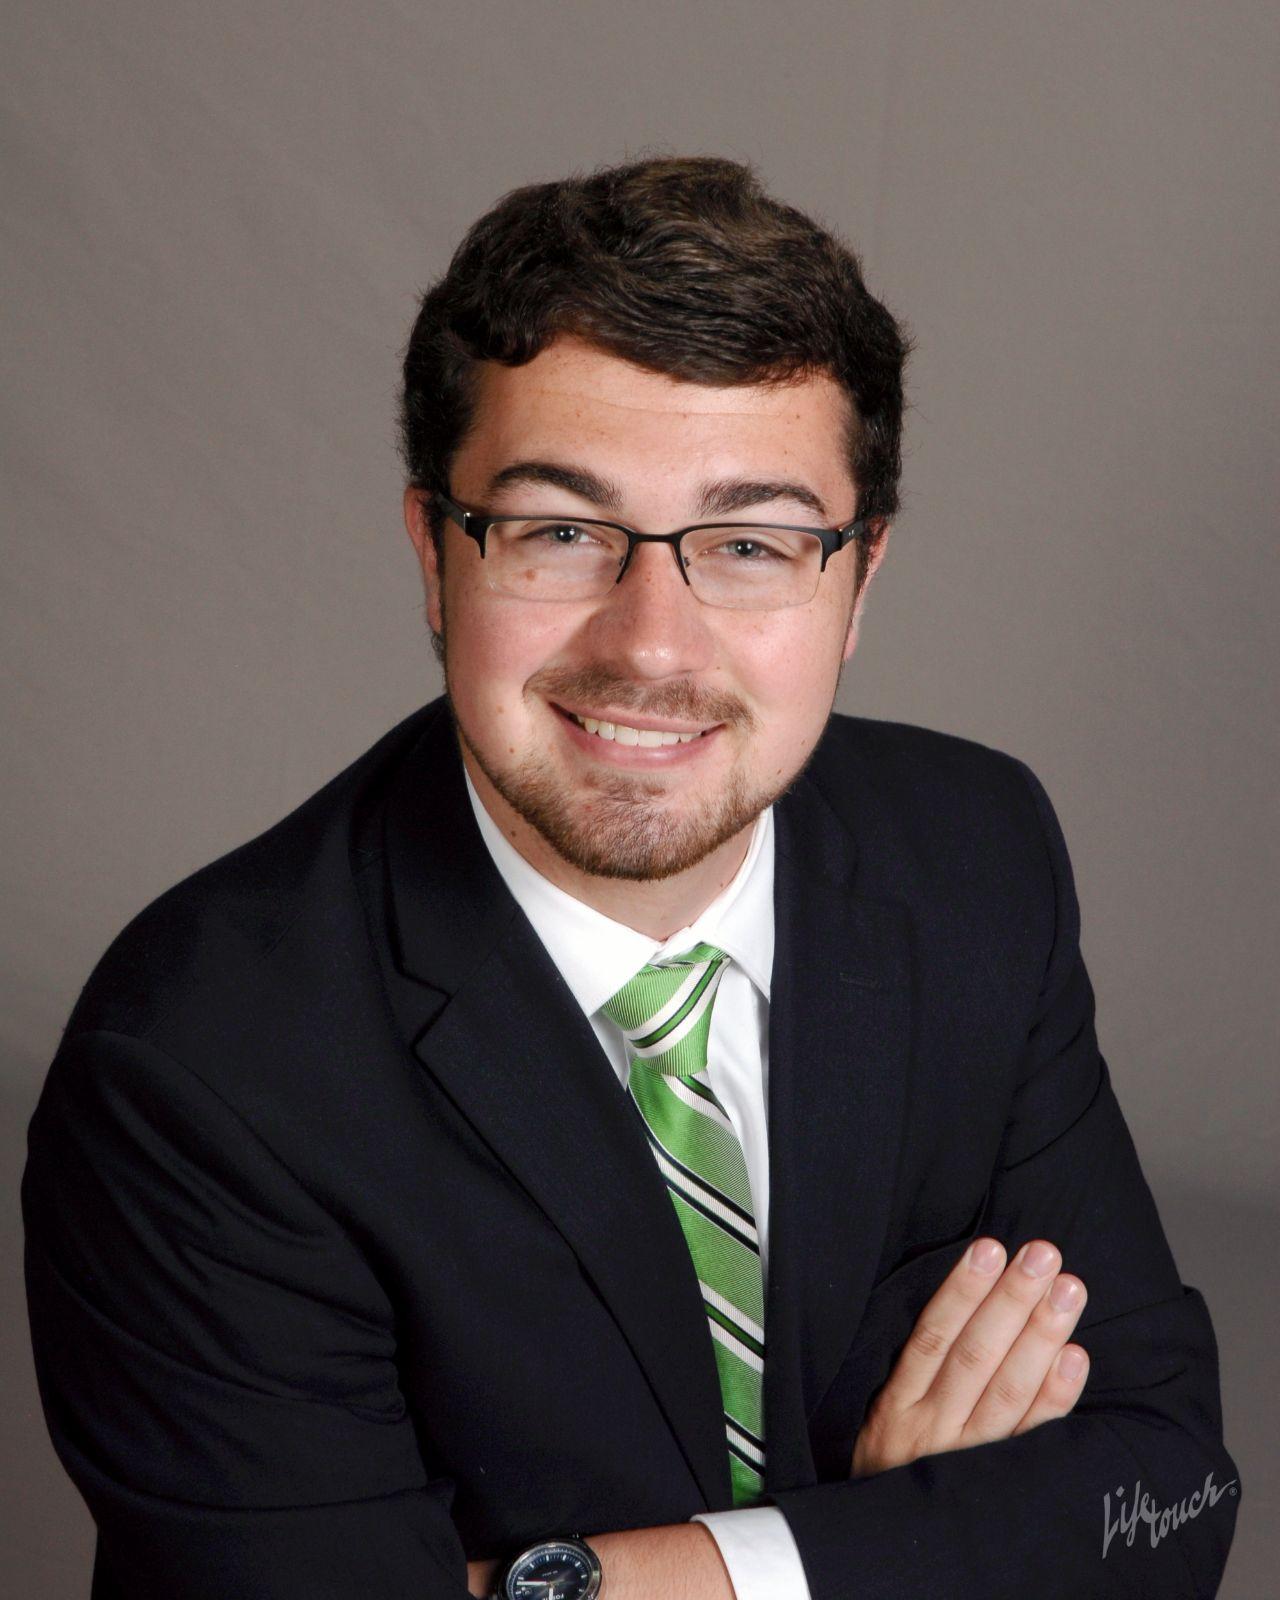 Kyle Brassell portrait picture